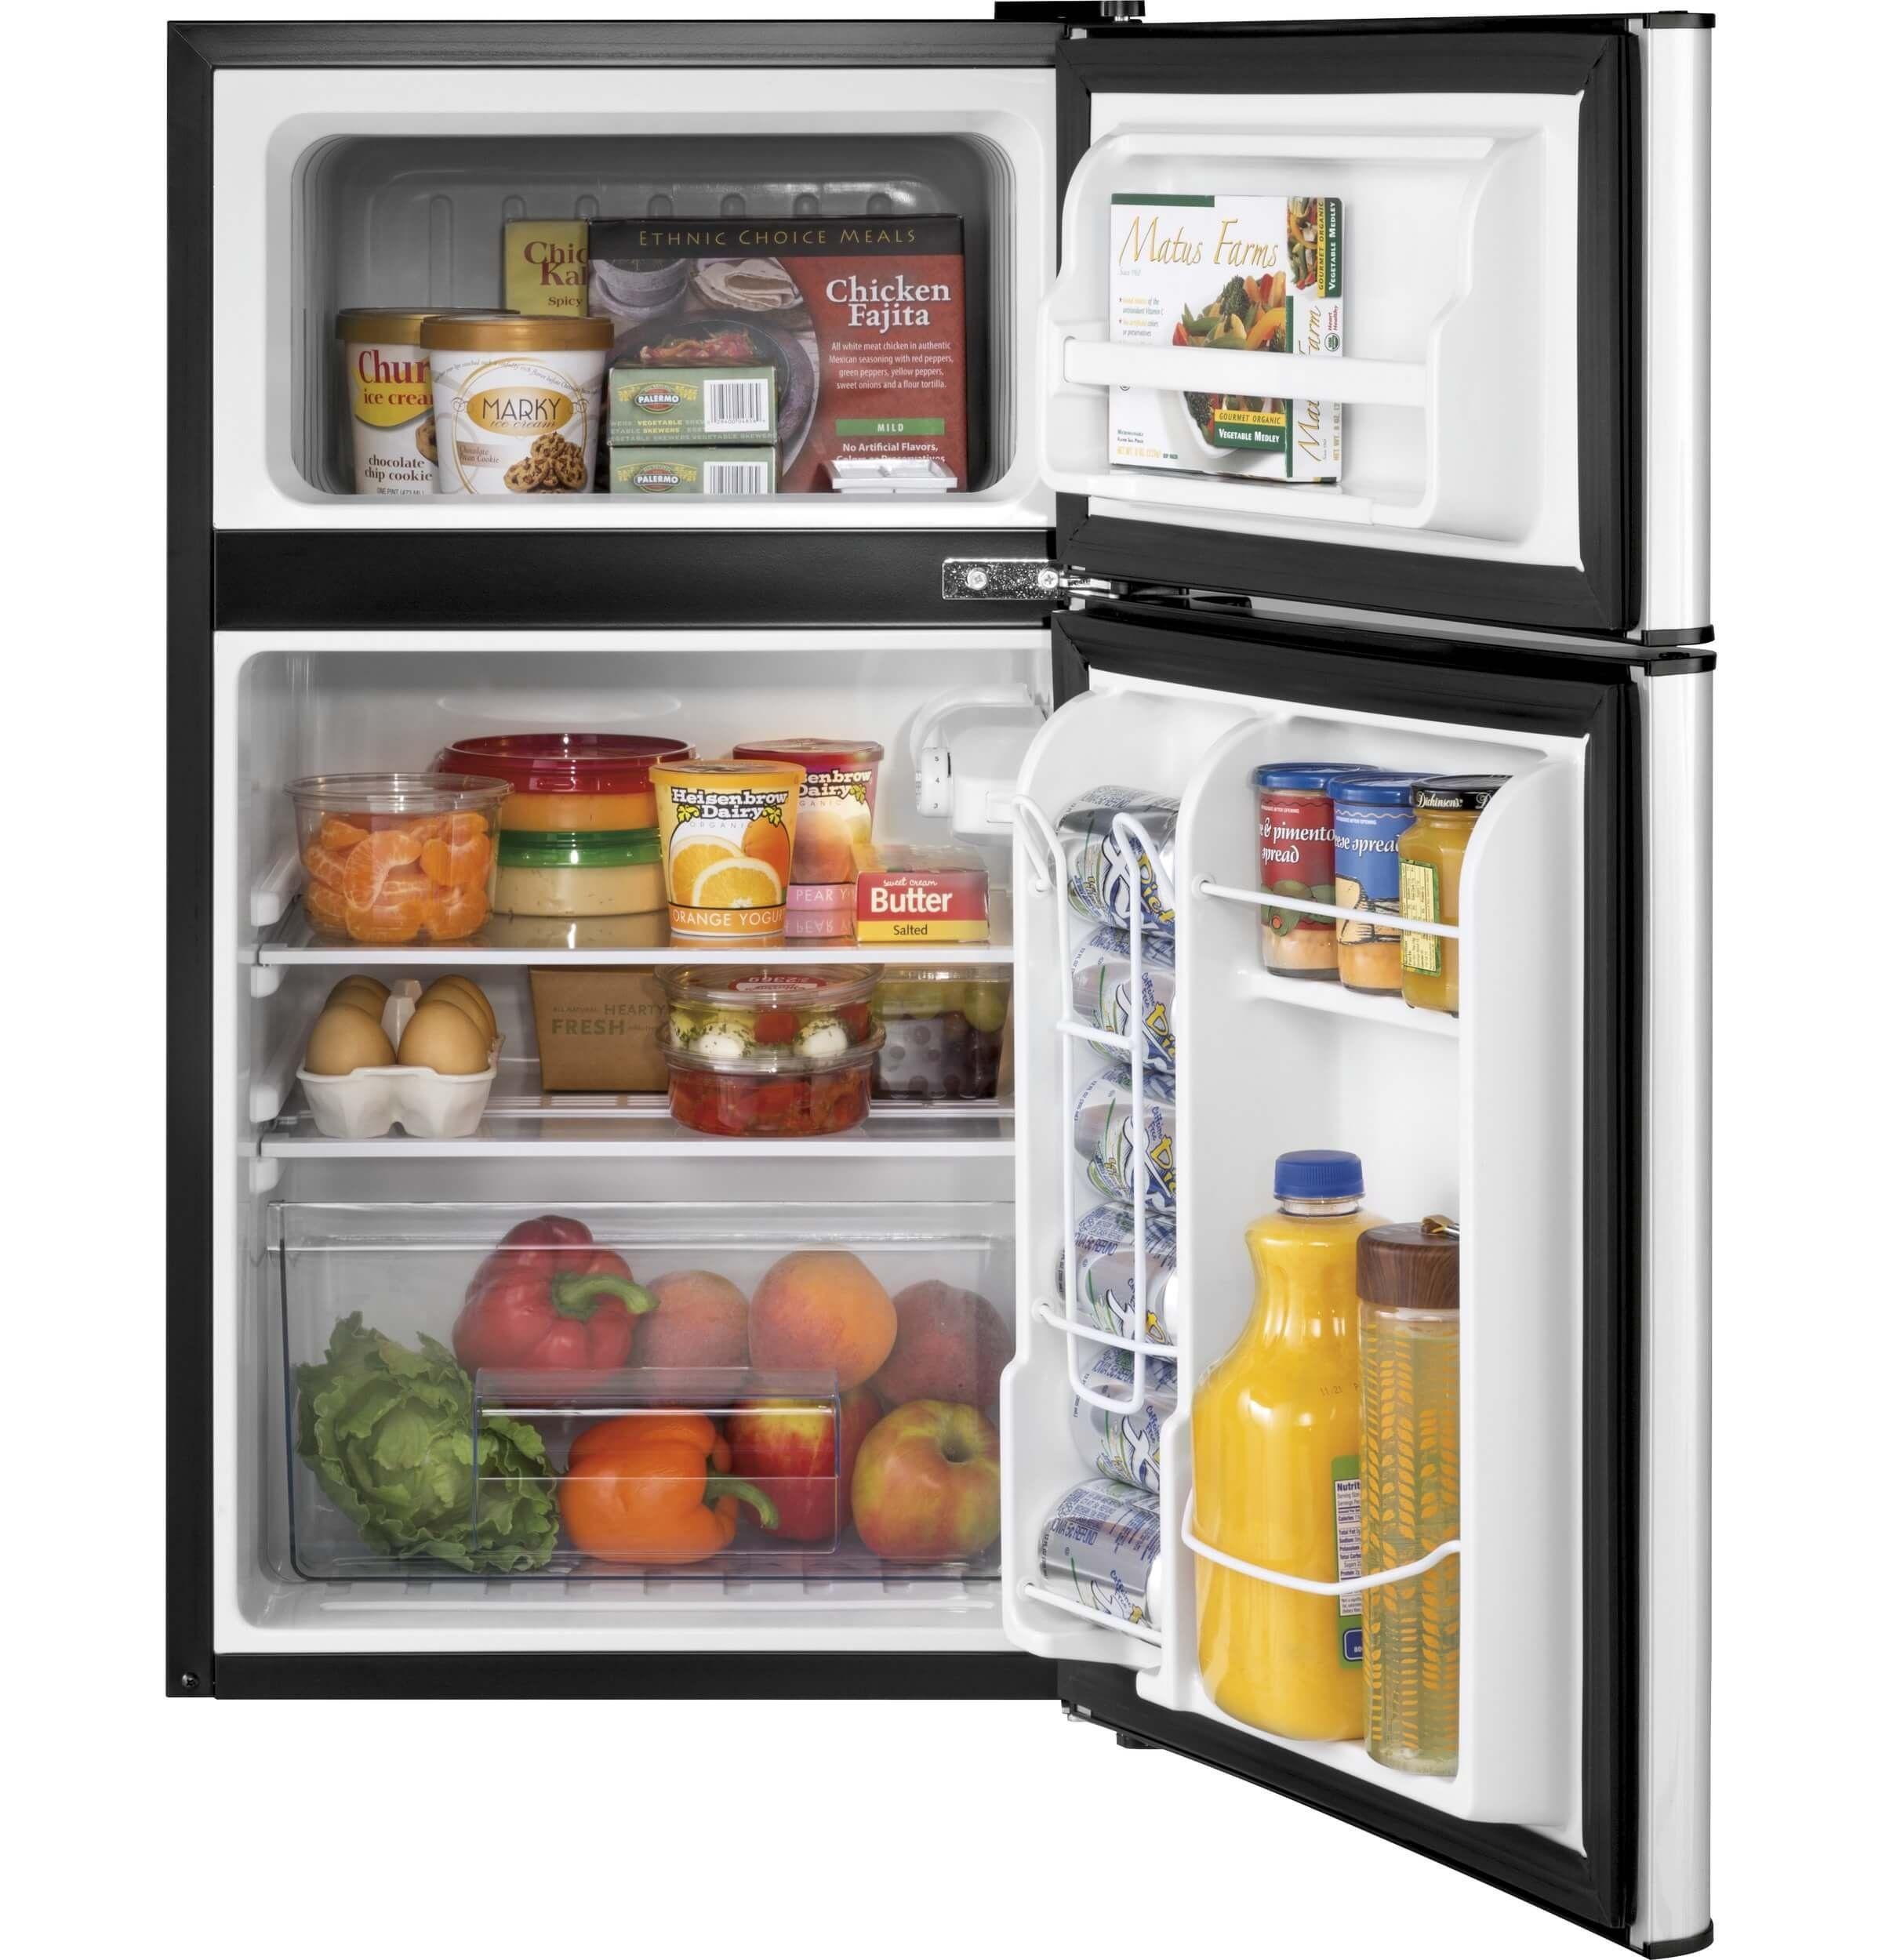 Haier 3 2 Cu Ft Refrigerator Stainless Steel 2door For Dorm Garage Camper Gameroom Basement Or Office Compact Refrigerator Mini Fridge With Freezer Mini Fridge